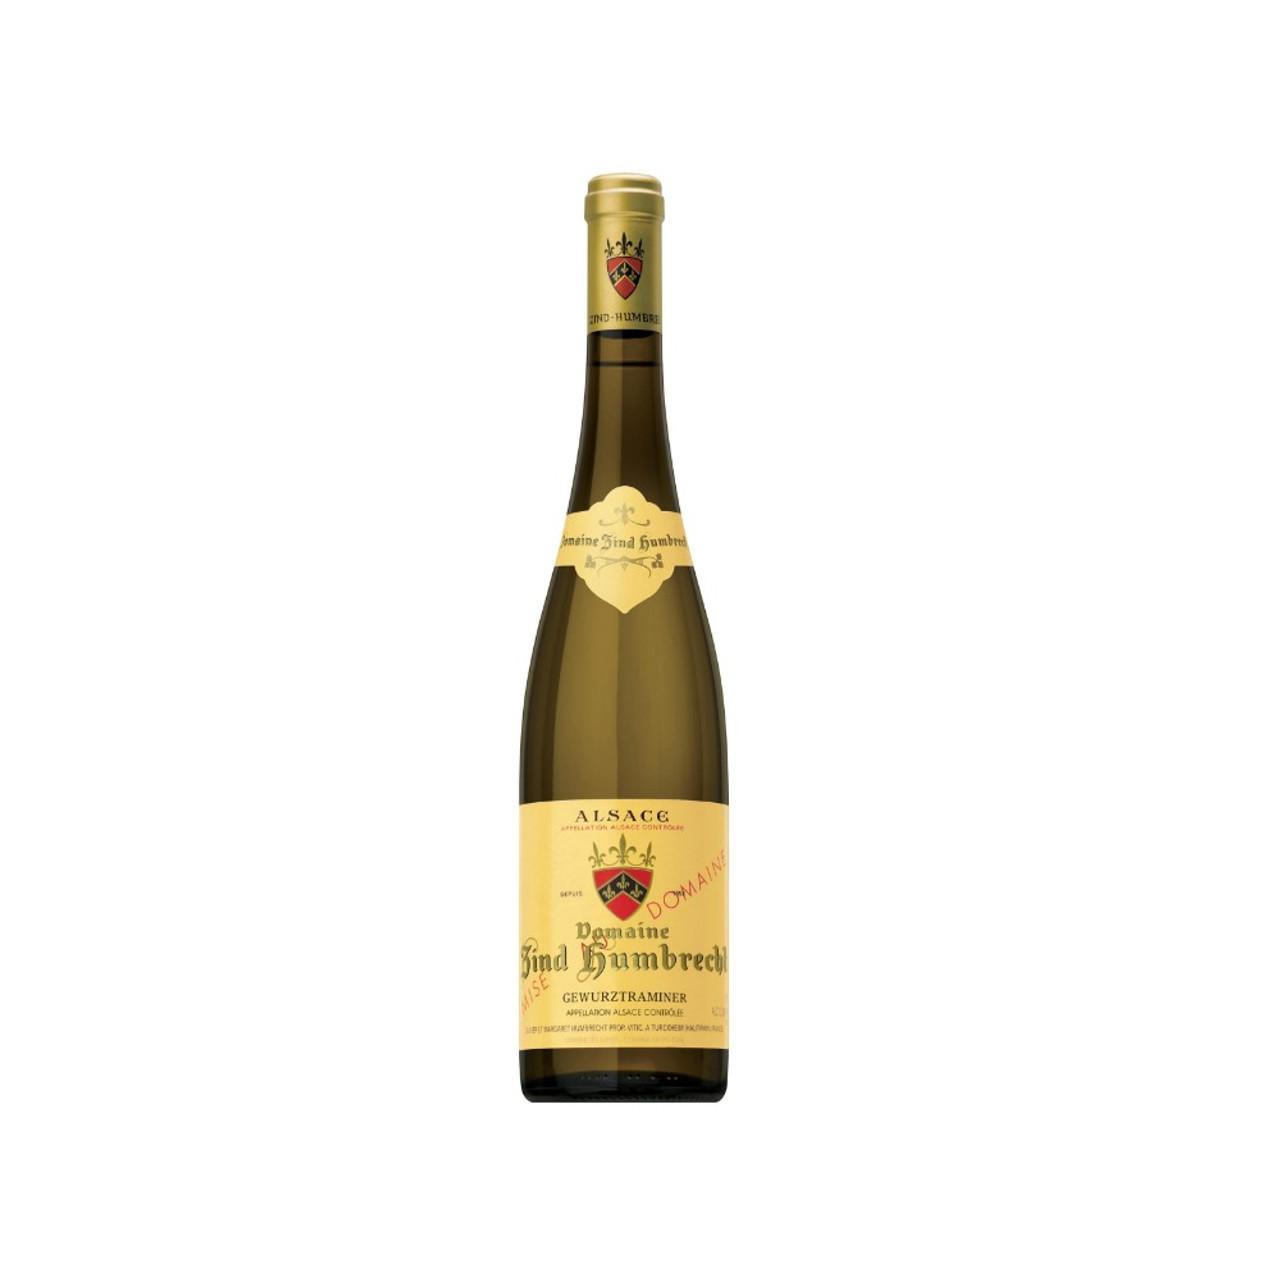 Domaine Zind-Humbrecht, Alsace Gewurztraminer 2016